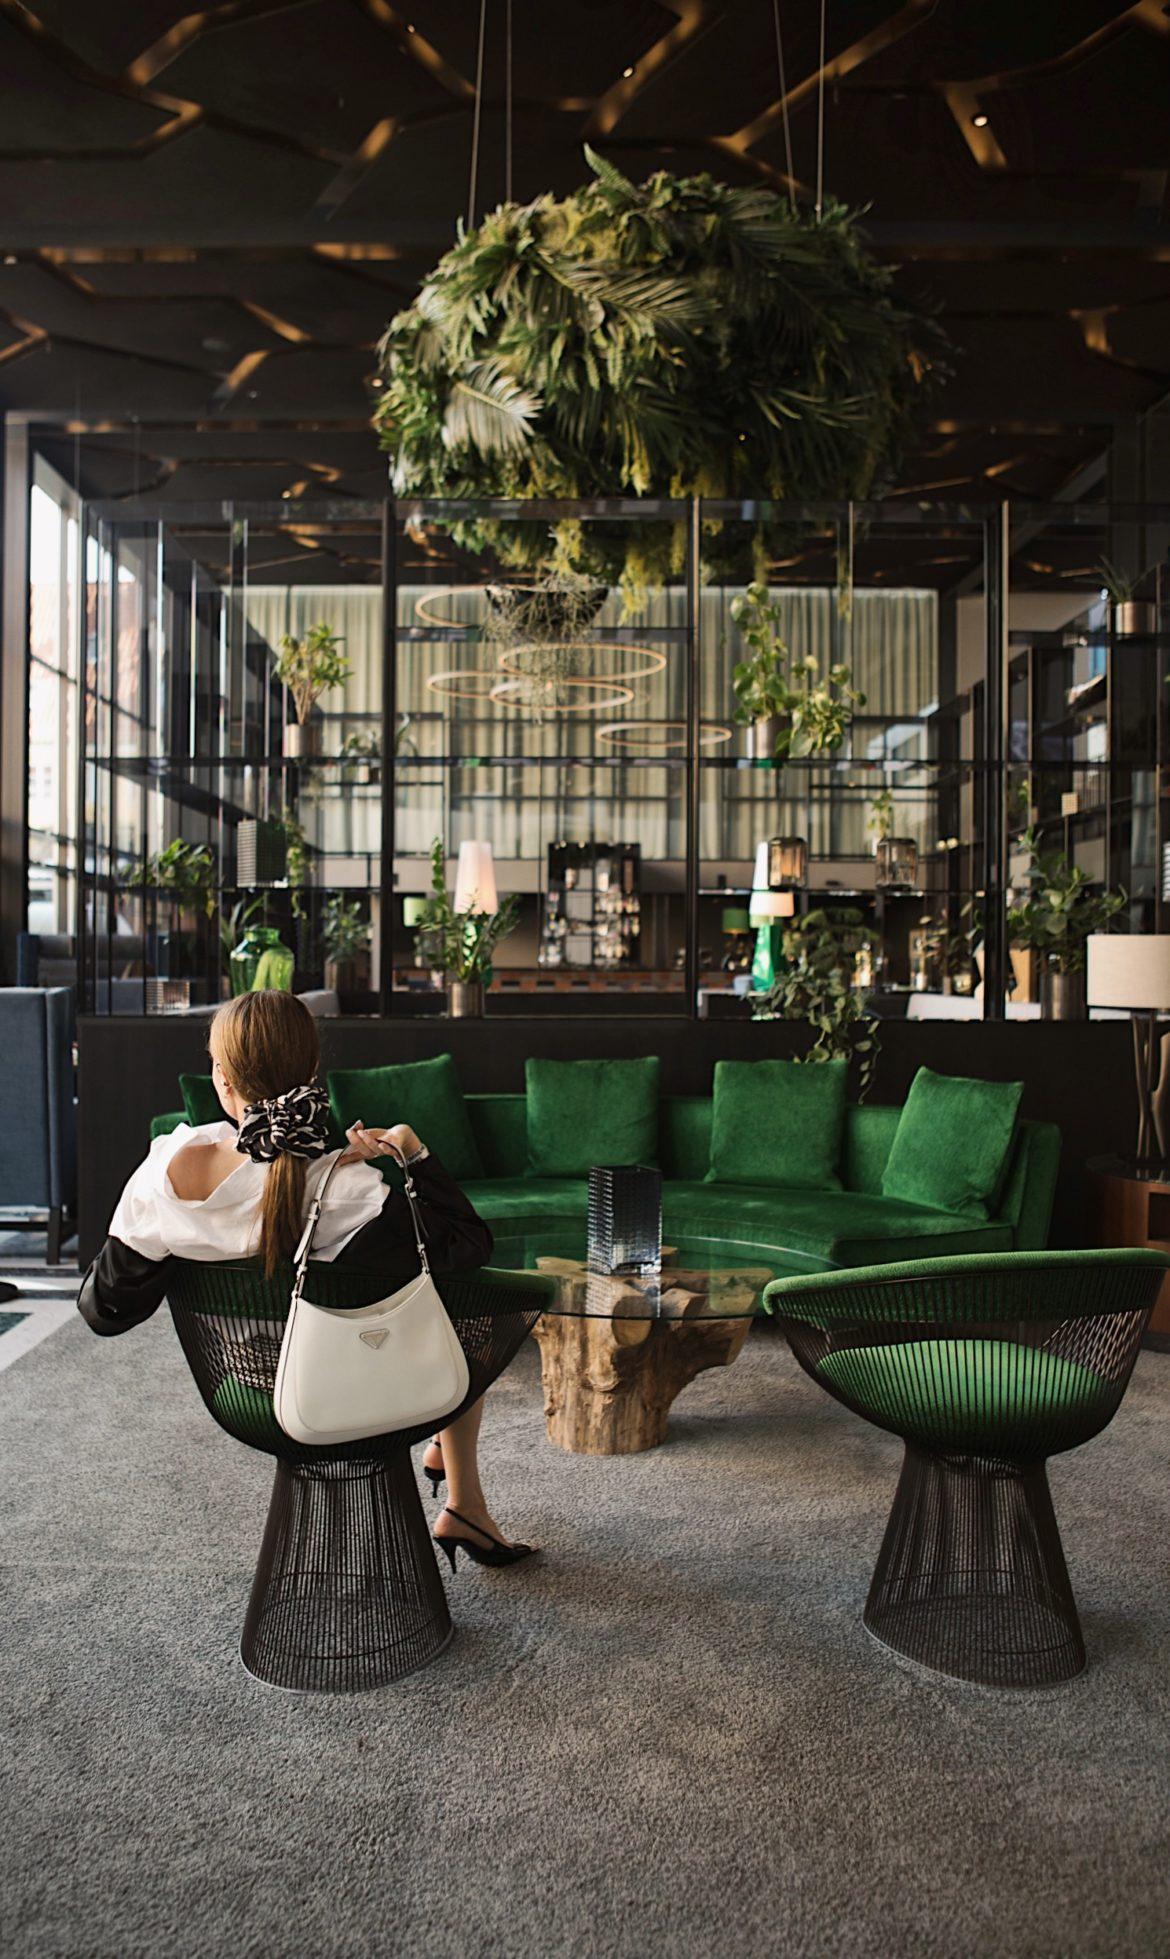 Skt Petri best design boutique hotel in copenhagen lobby platner chair green urban jungle prada cloe julia comil condenast cphfw copenhagen fashion week